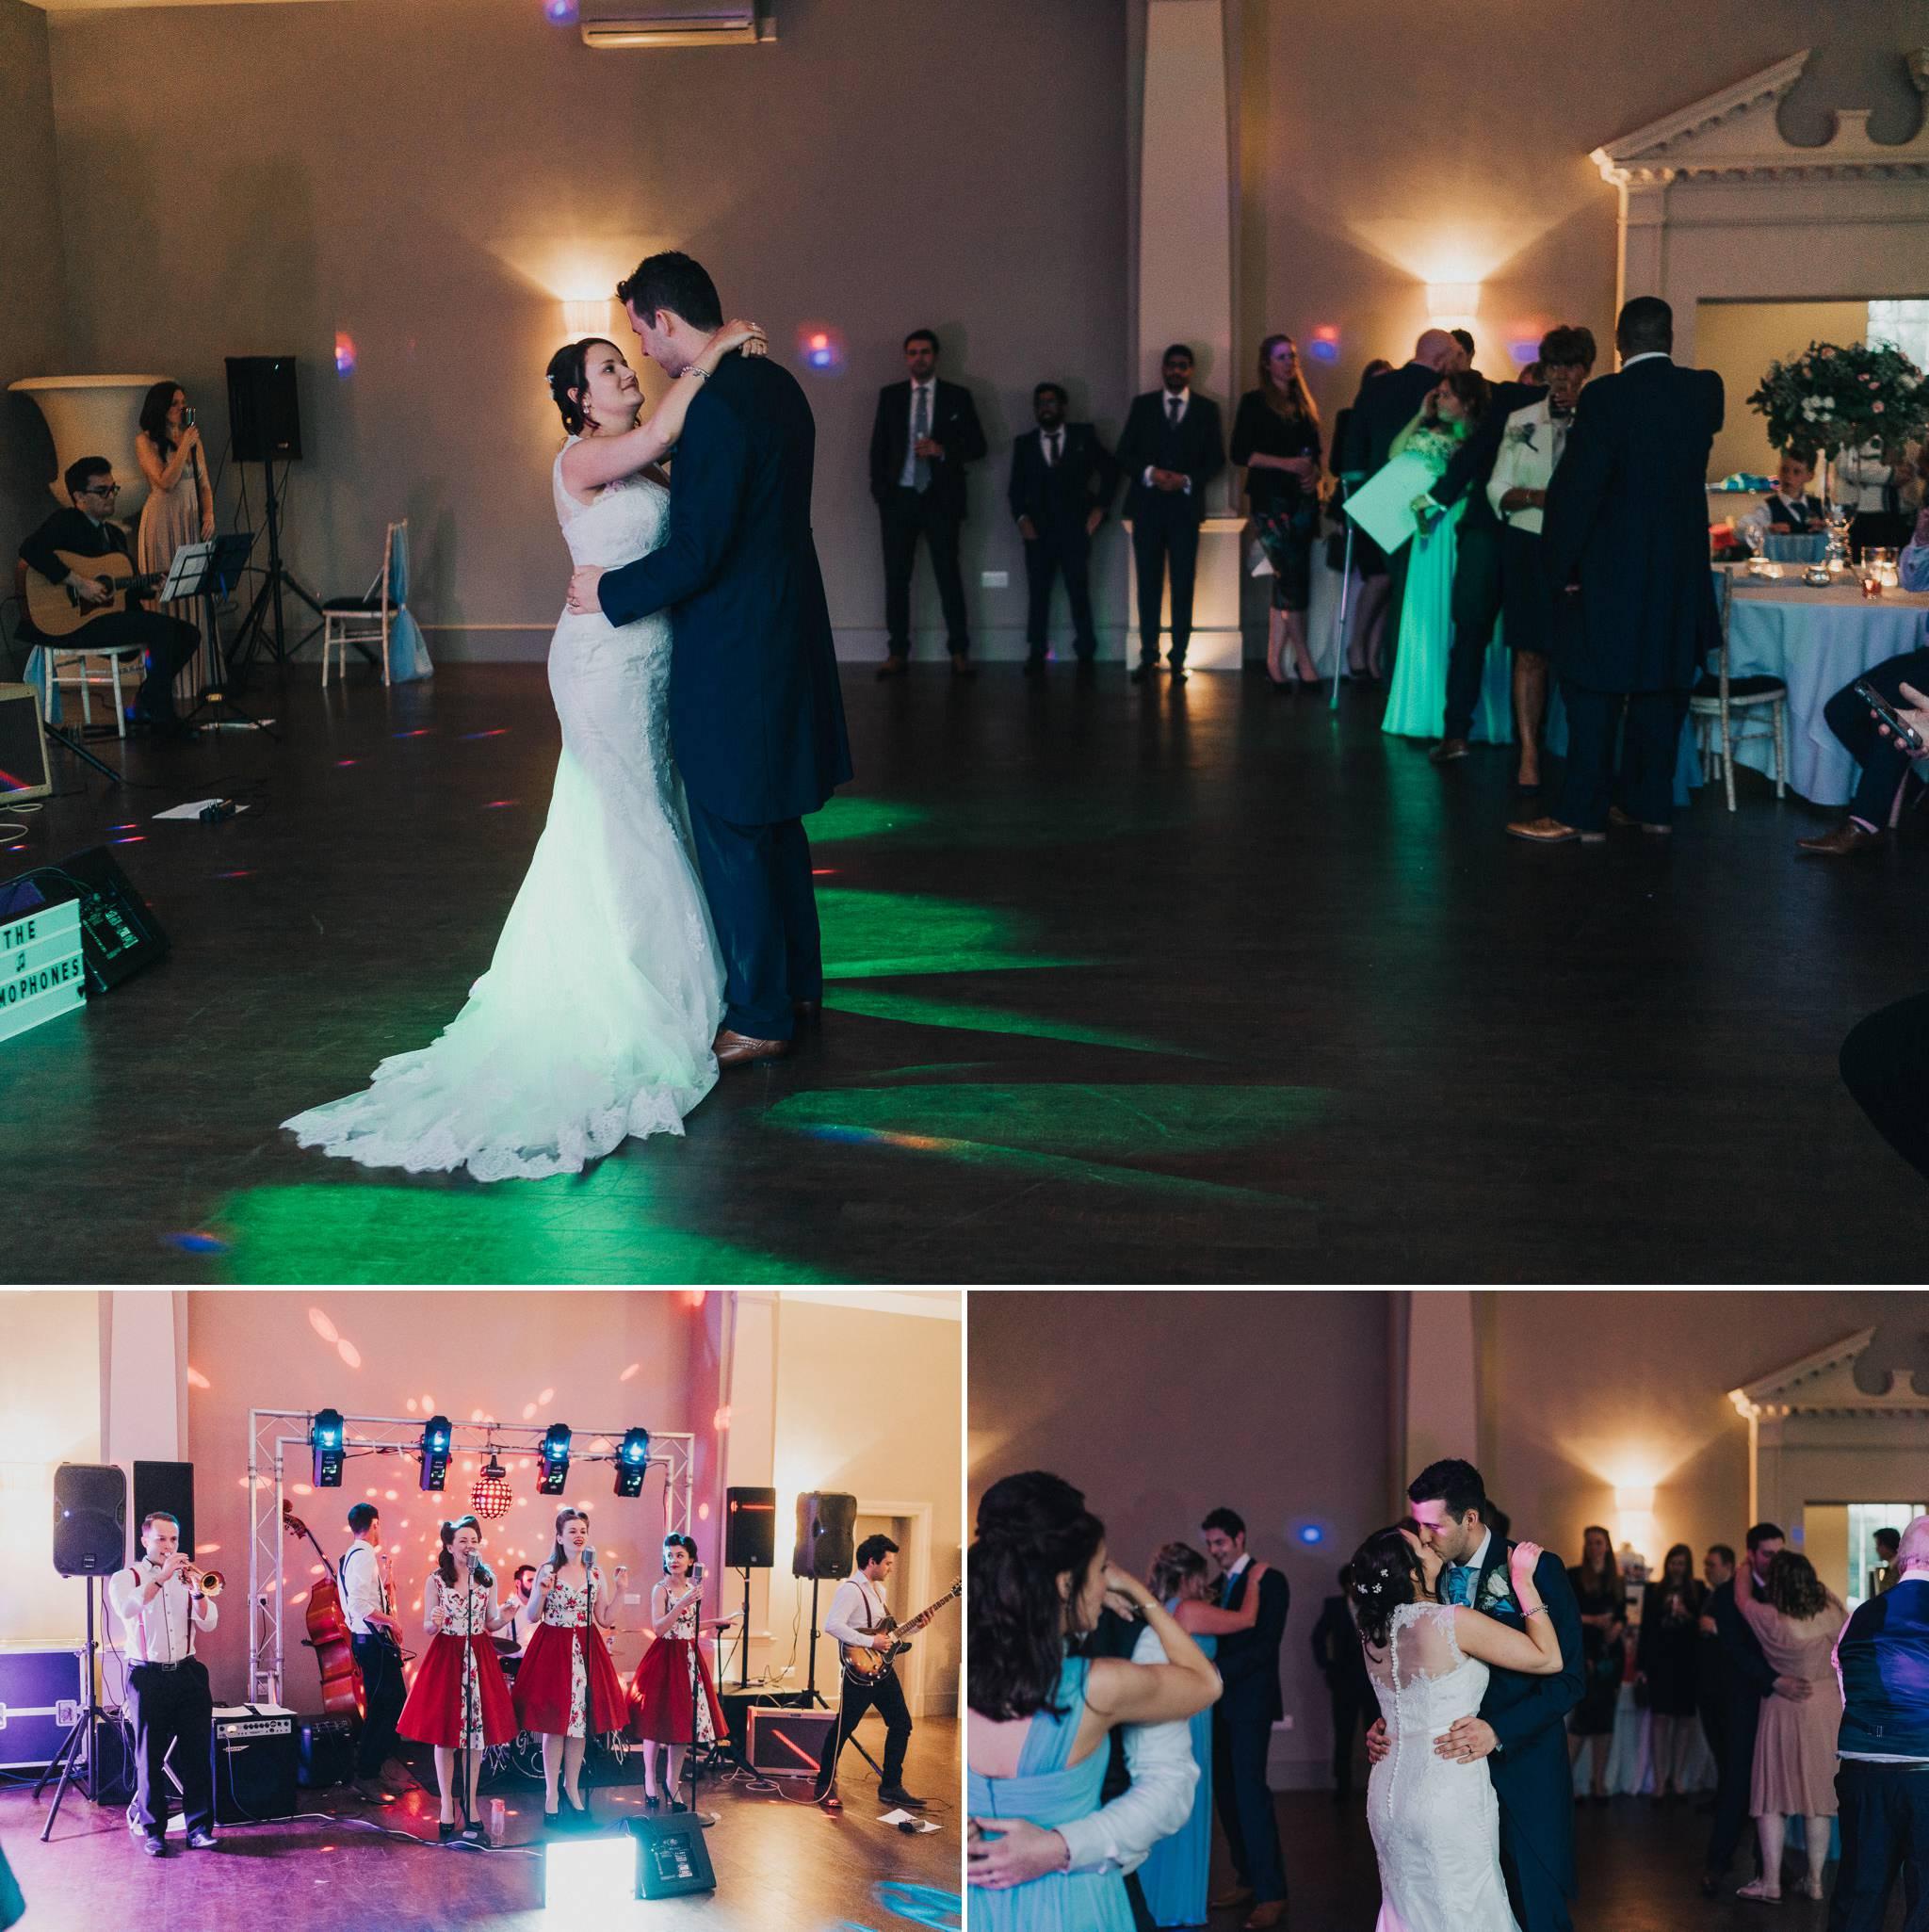 stubton-hall-wedding-photography 23.jpg